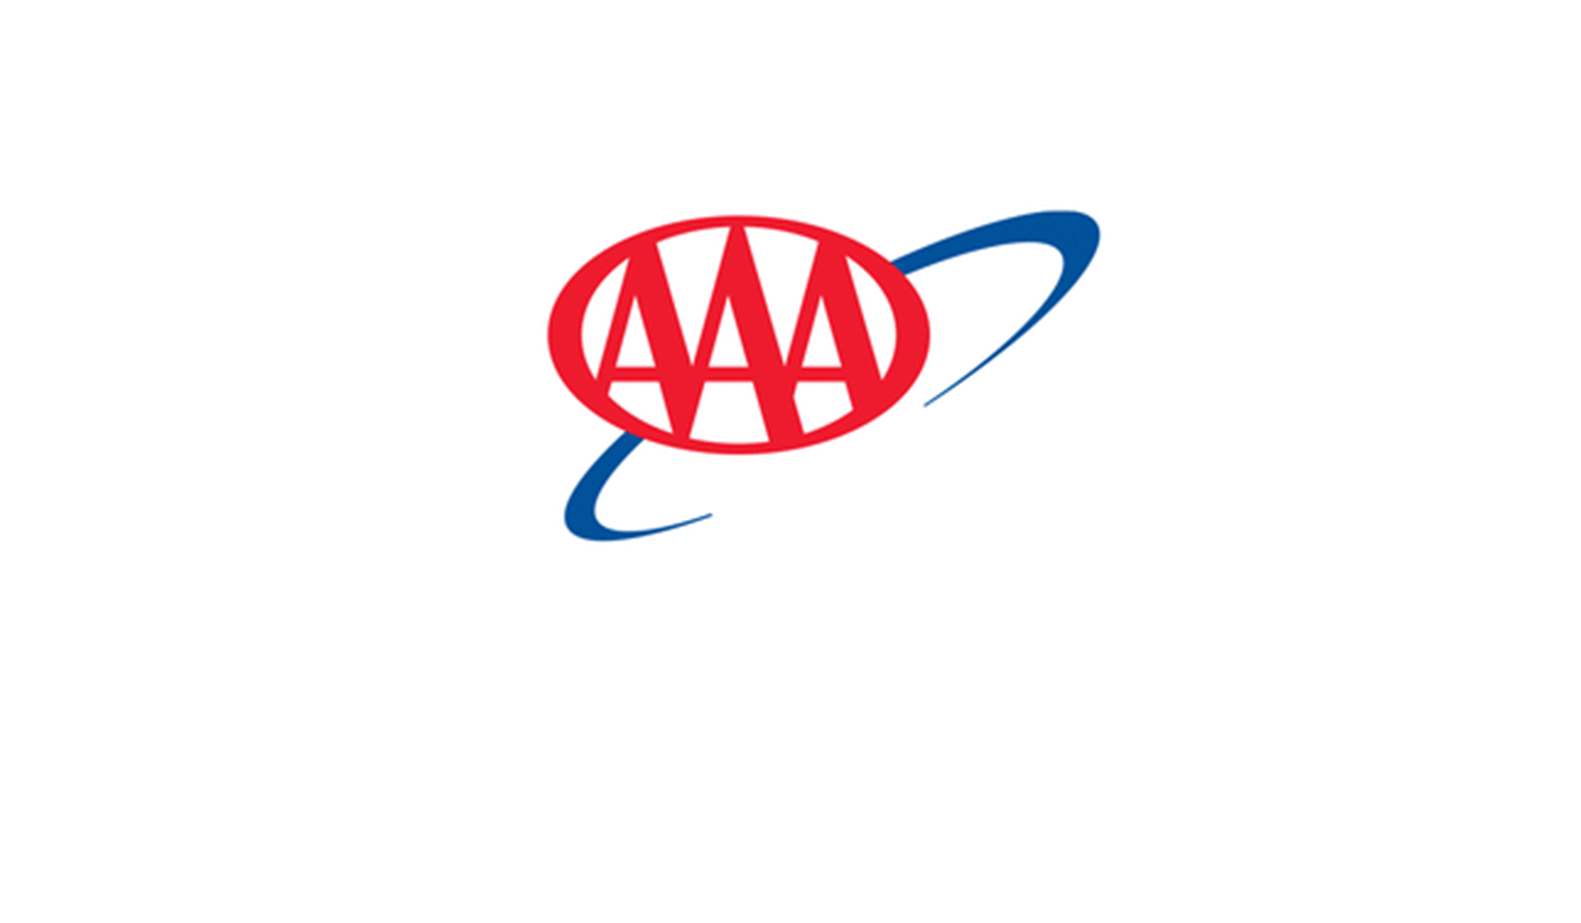 AAA Insurance Co